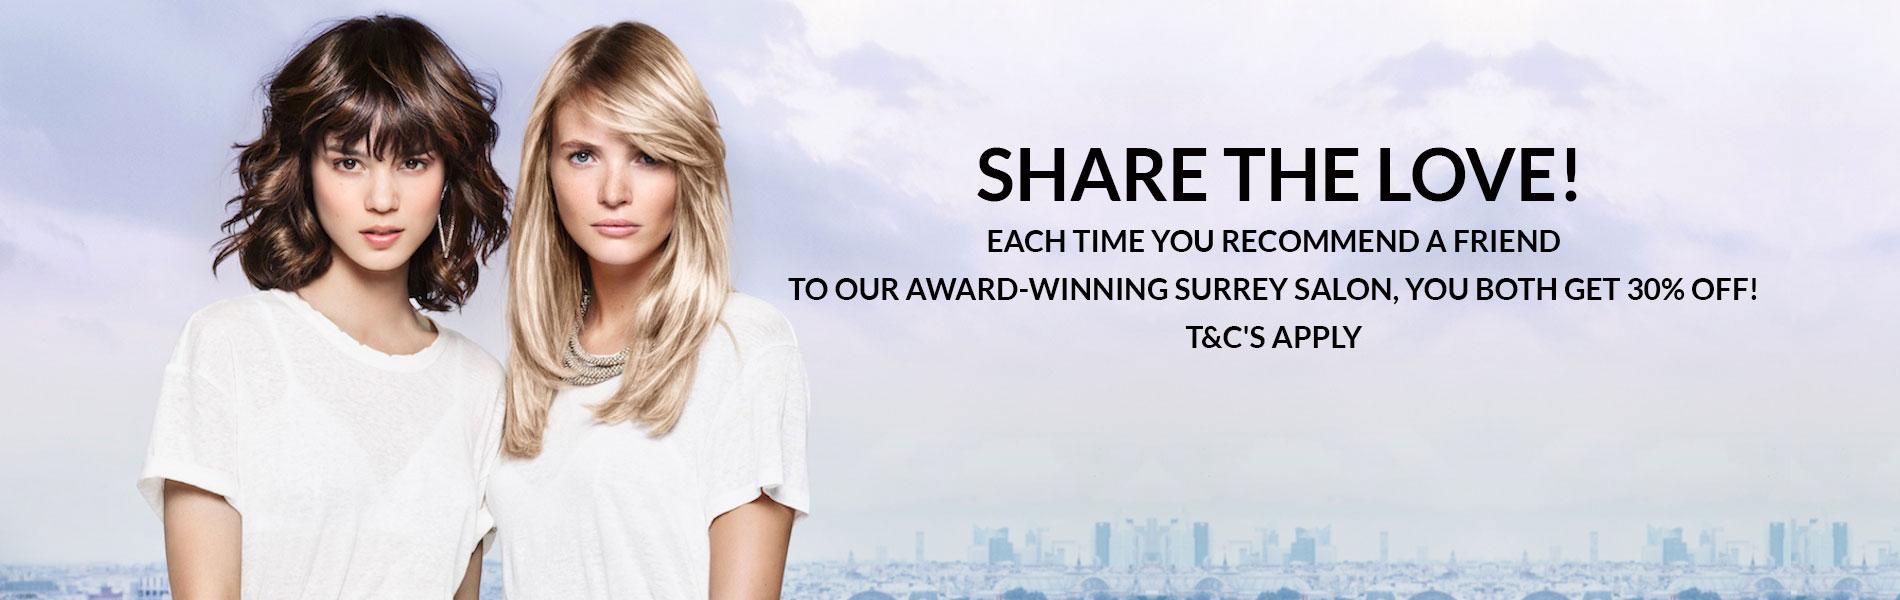 best salon offers Surrey, hair discounts Surrey